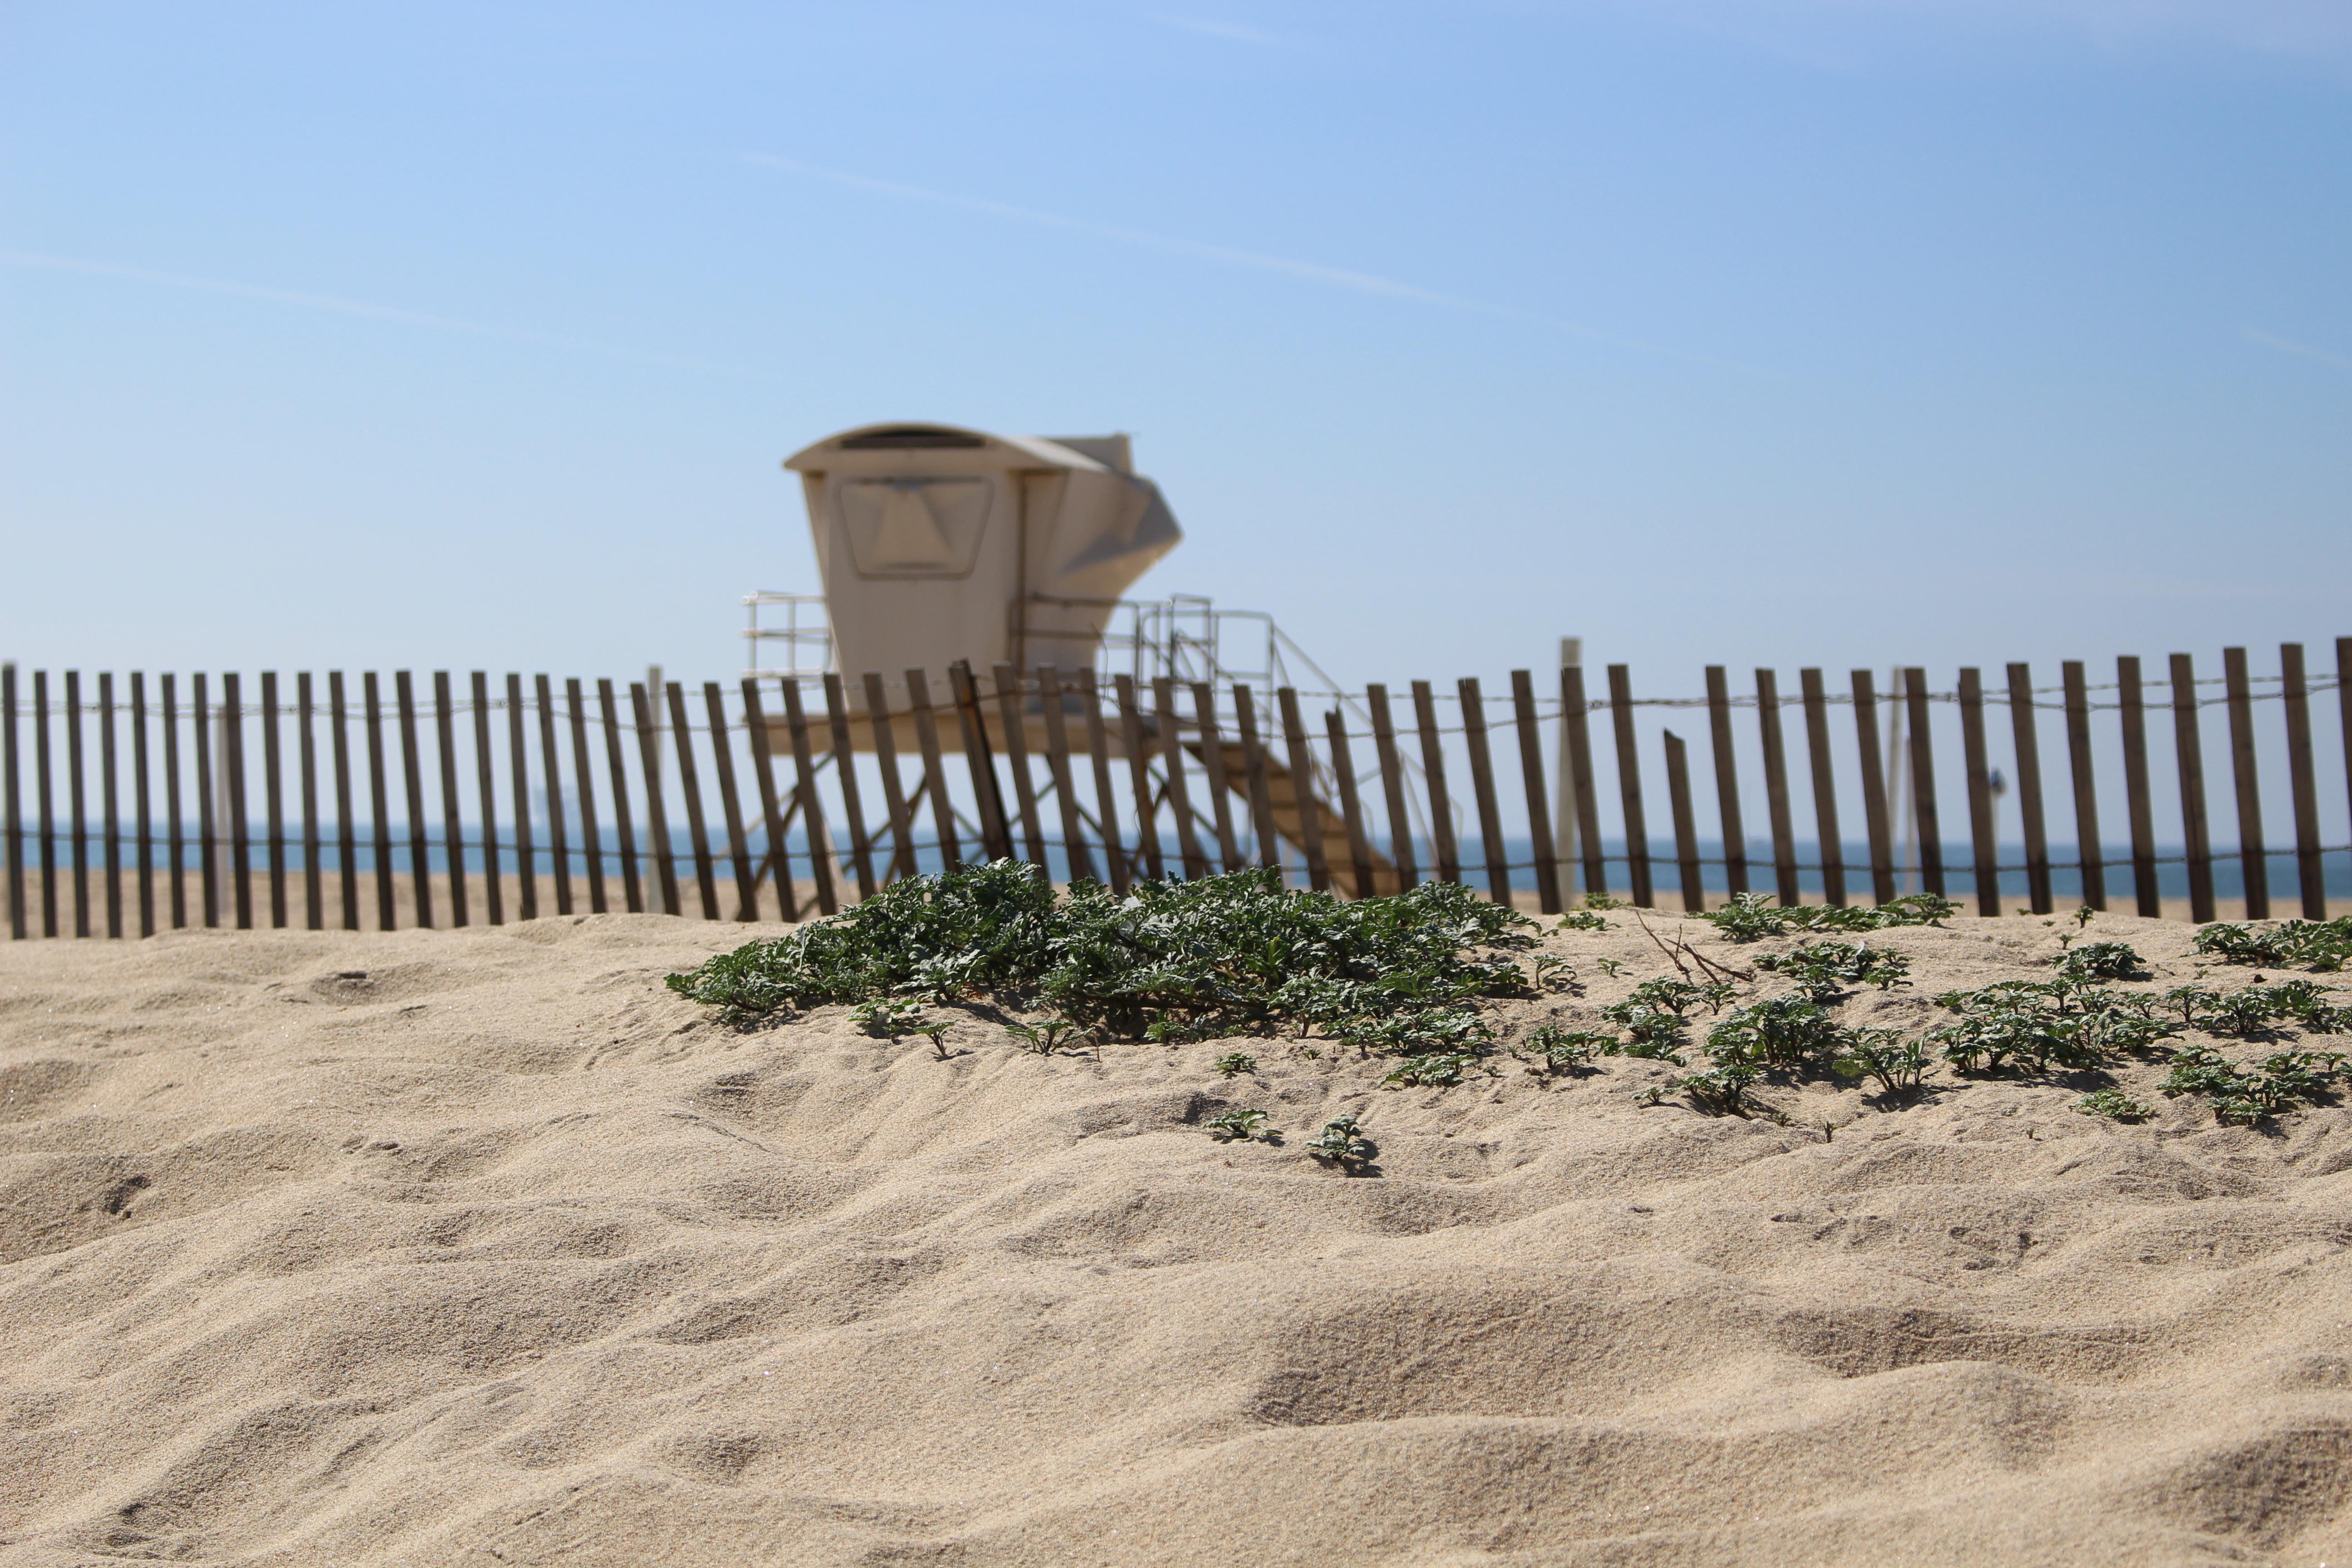 Bolsa Chica State Beach RV Camping